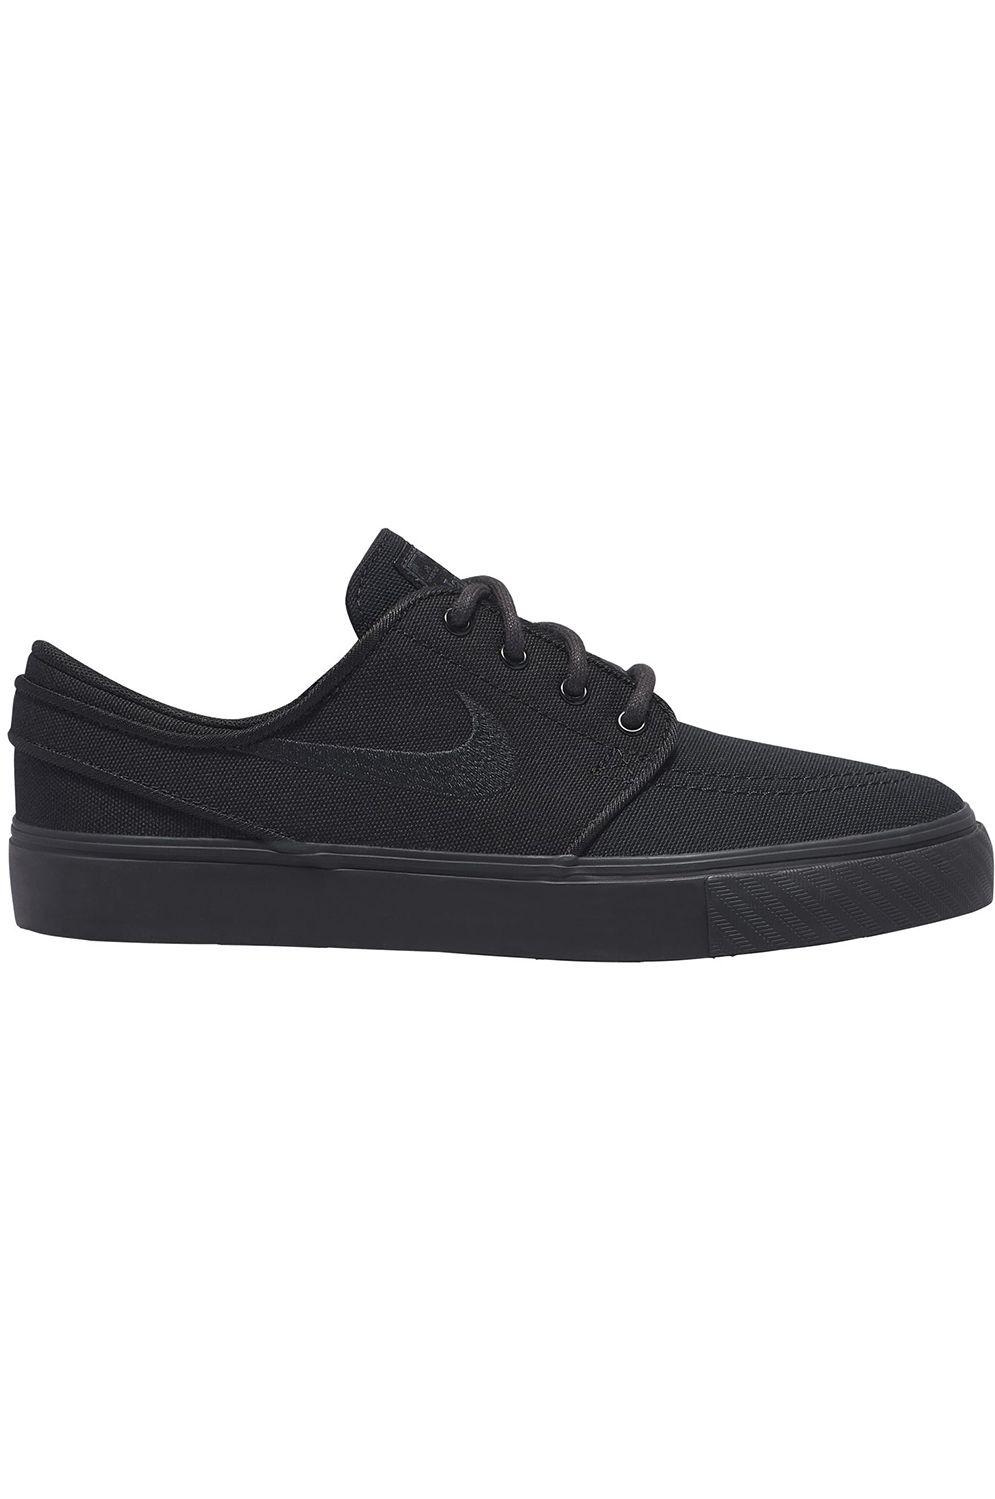 Tenis Nike Sb STEFAN JANOSKI Black/Black-Anthracite